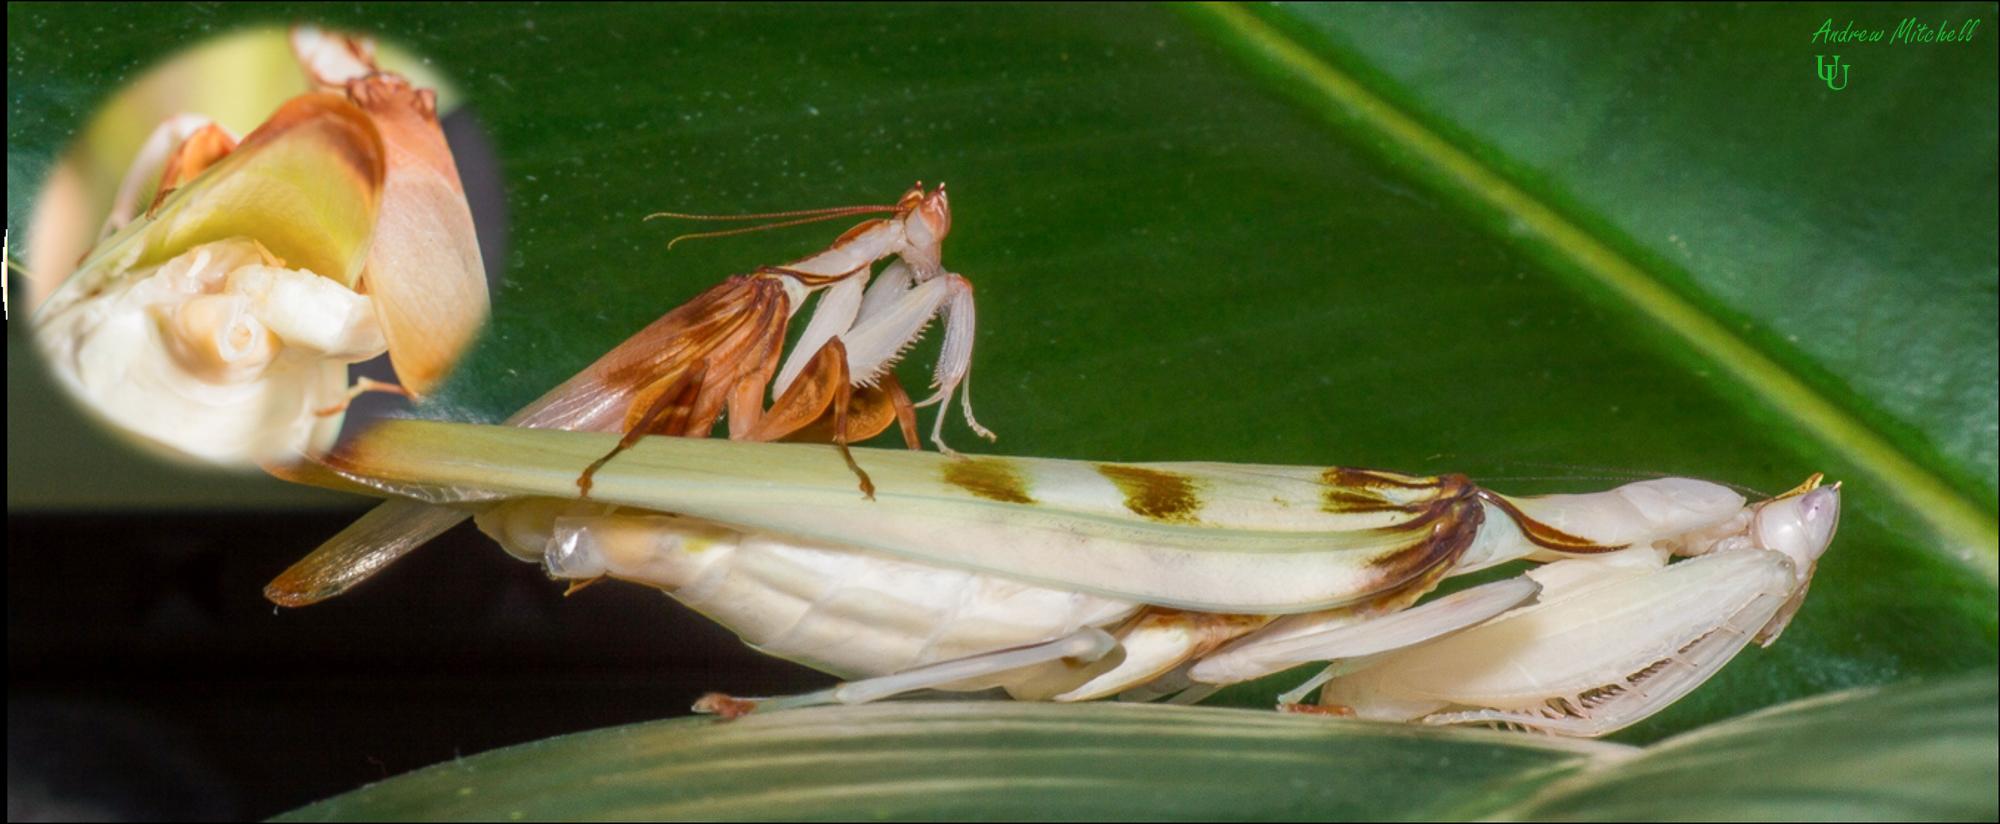 Hymenopus coronatus (Orchid Mantis) (Adult pair mating)